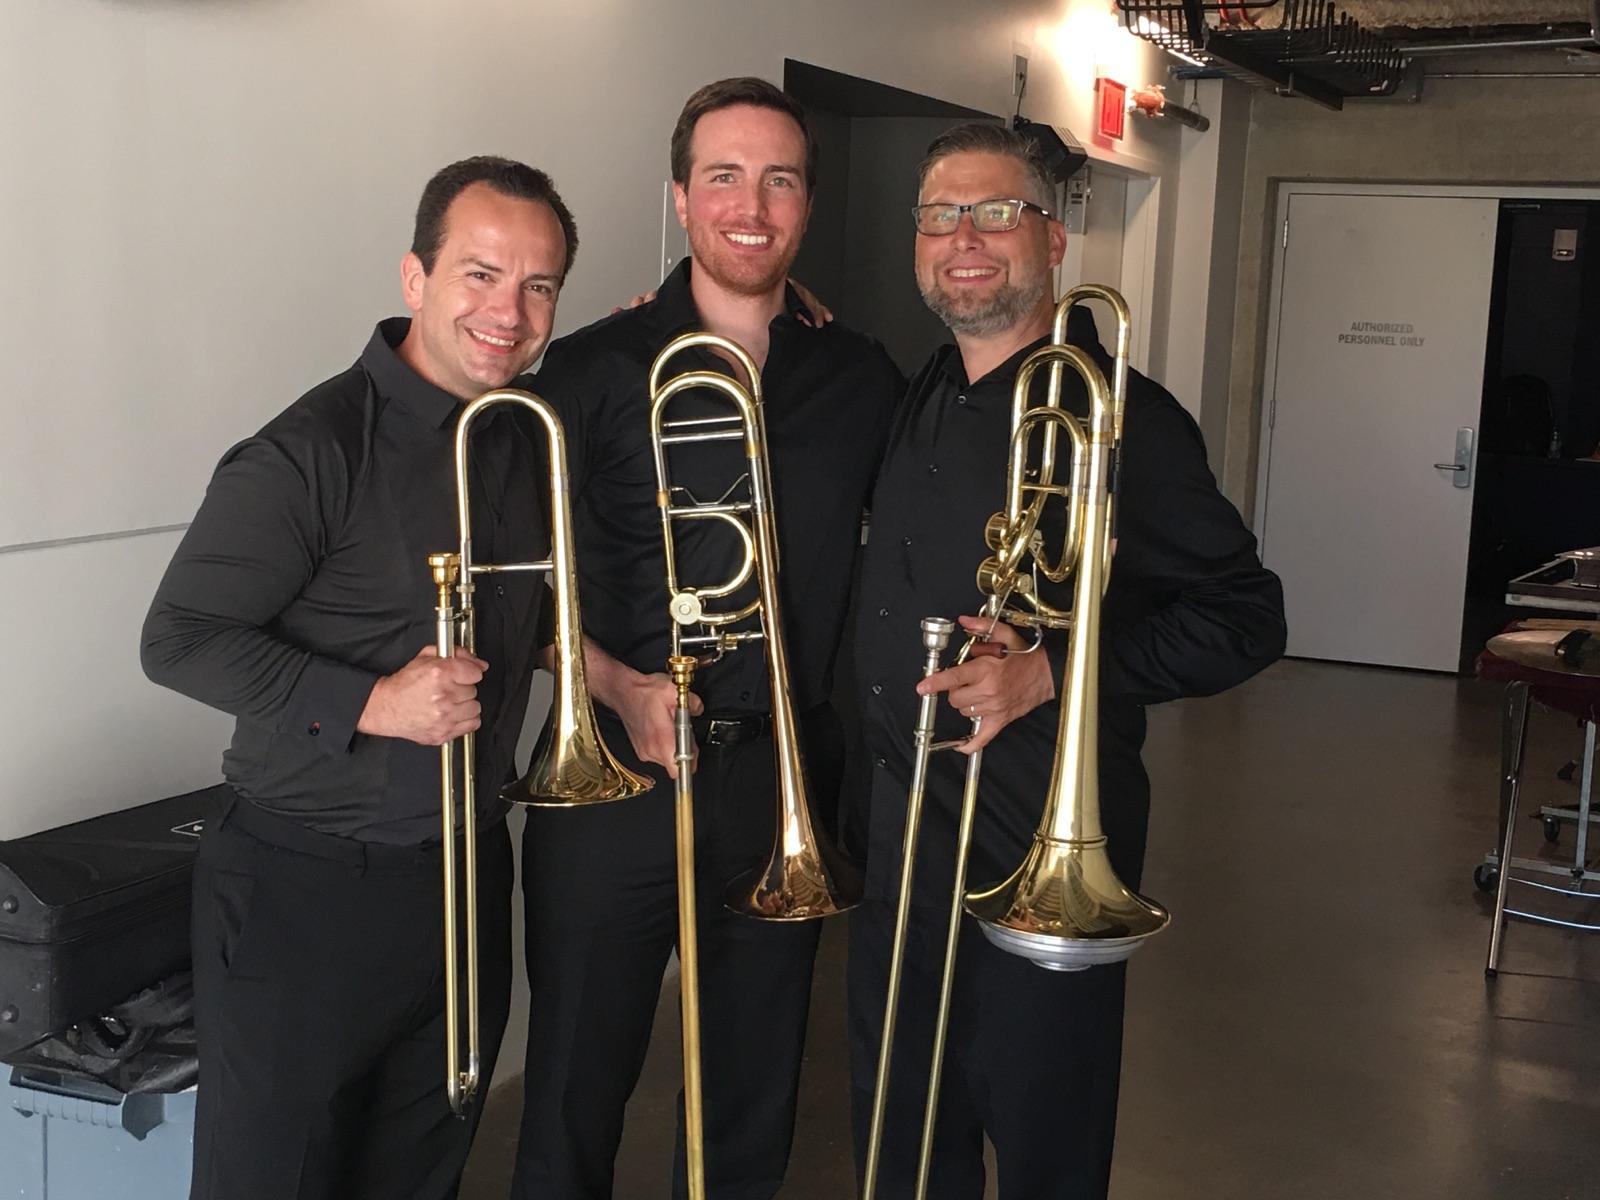 With Jim Nova and Denson Paul Pollard after a trio performance at the International Trombone Festival.